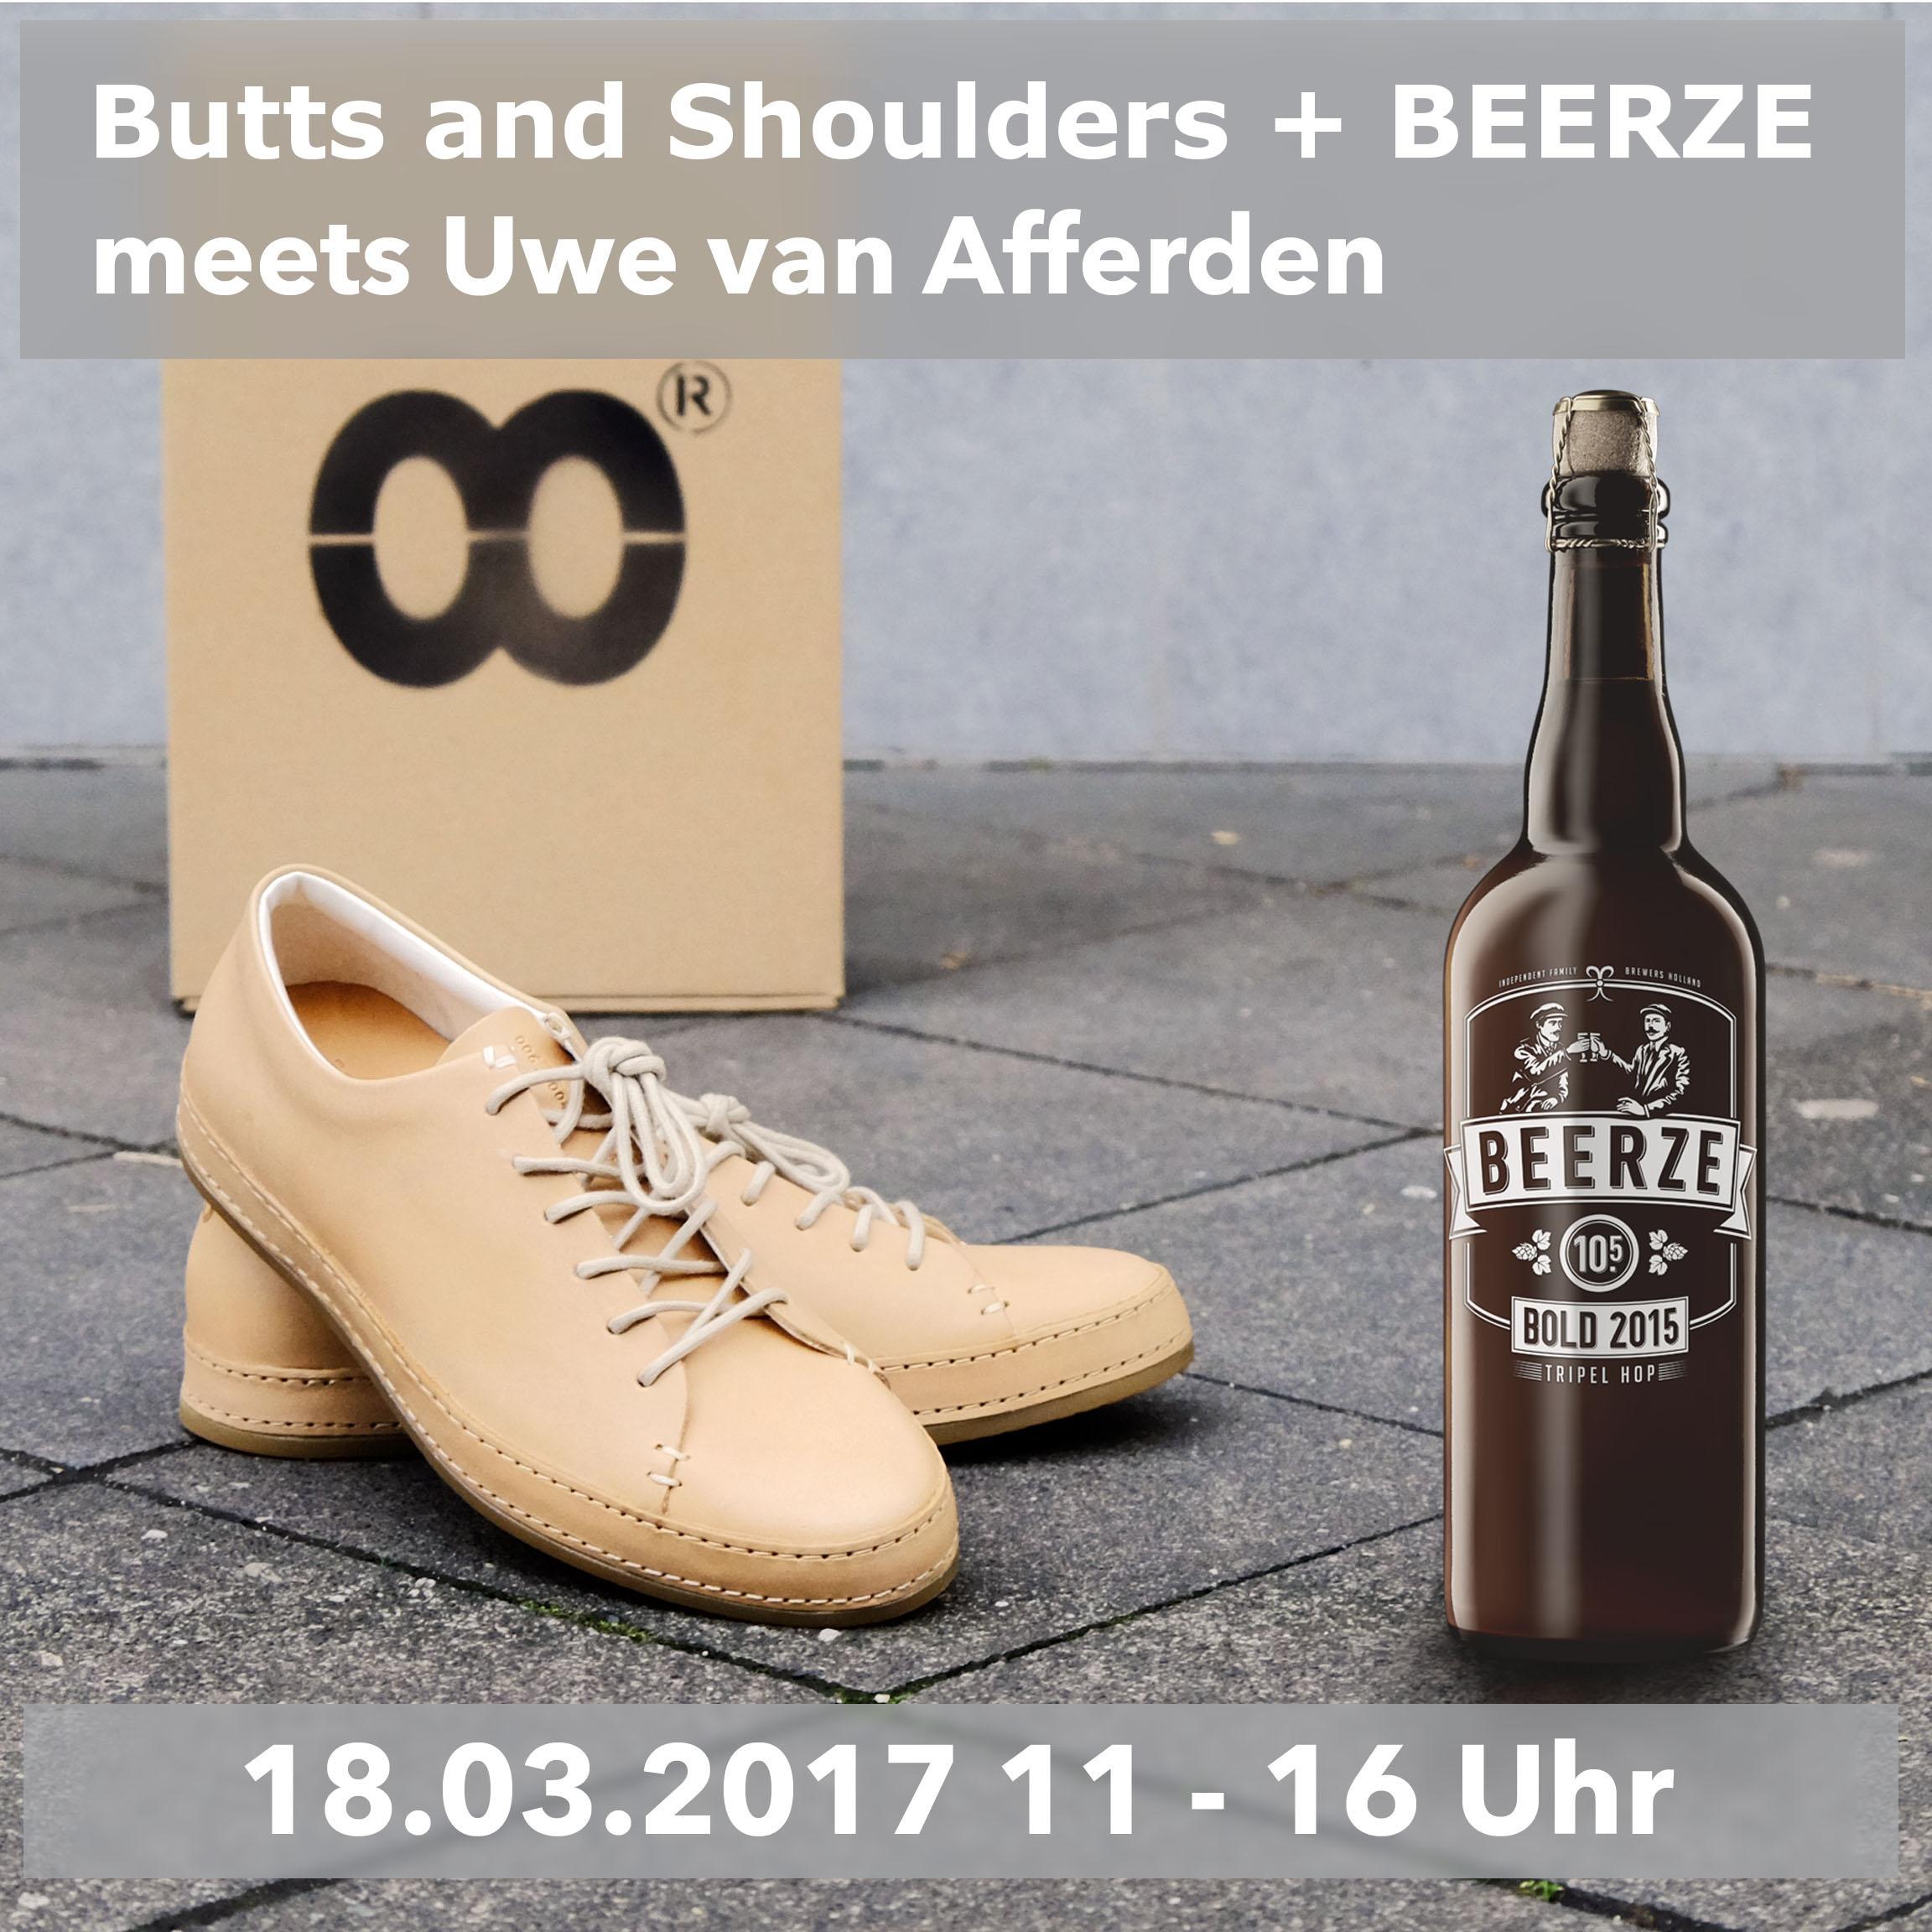 bier uwe van afferden shop m nnerkaufhaus atelier. Black Bedroom Furniture Sets. Home Design Ideas